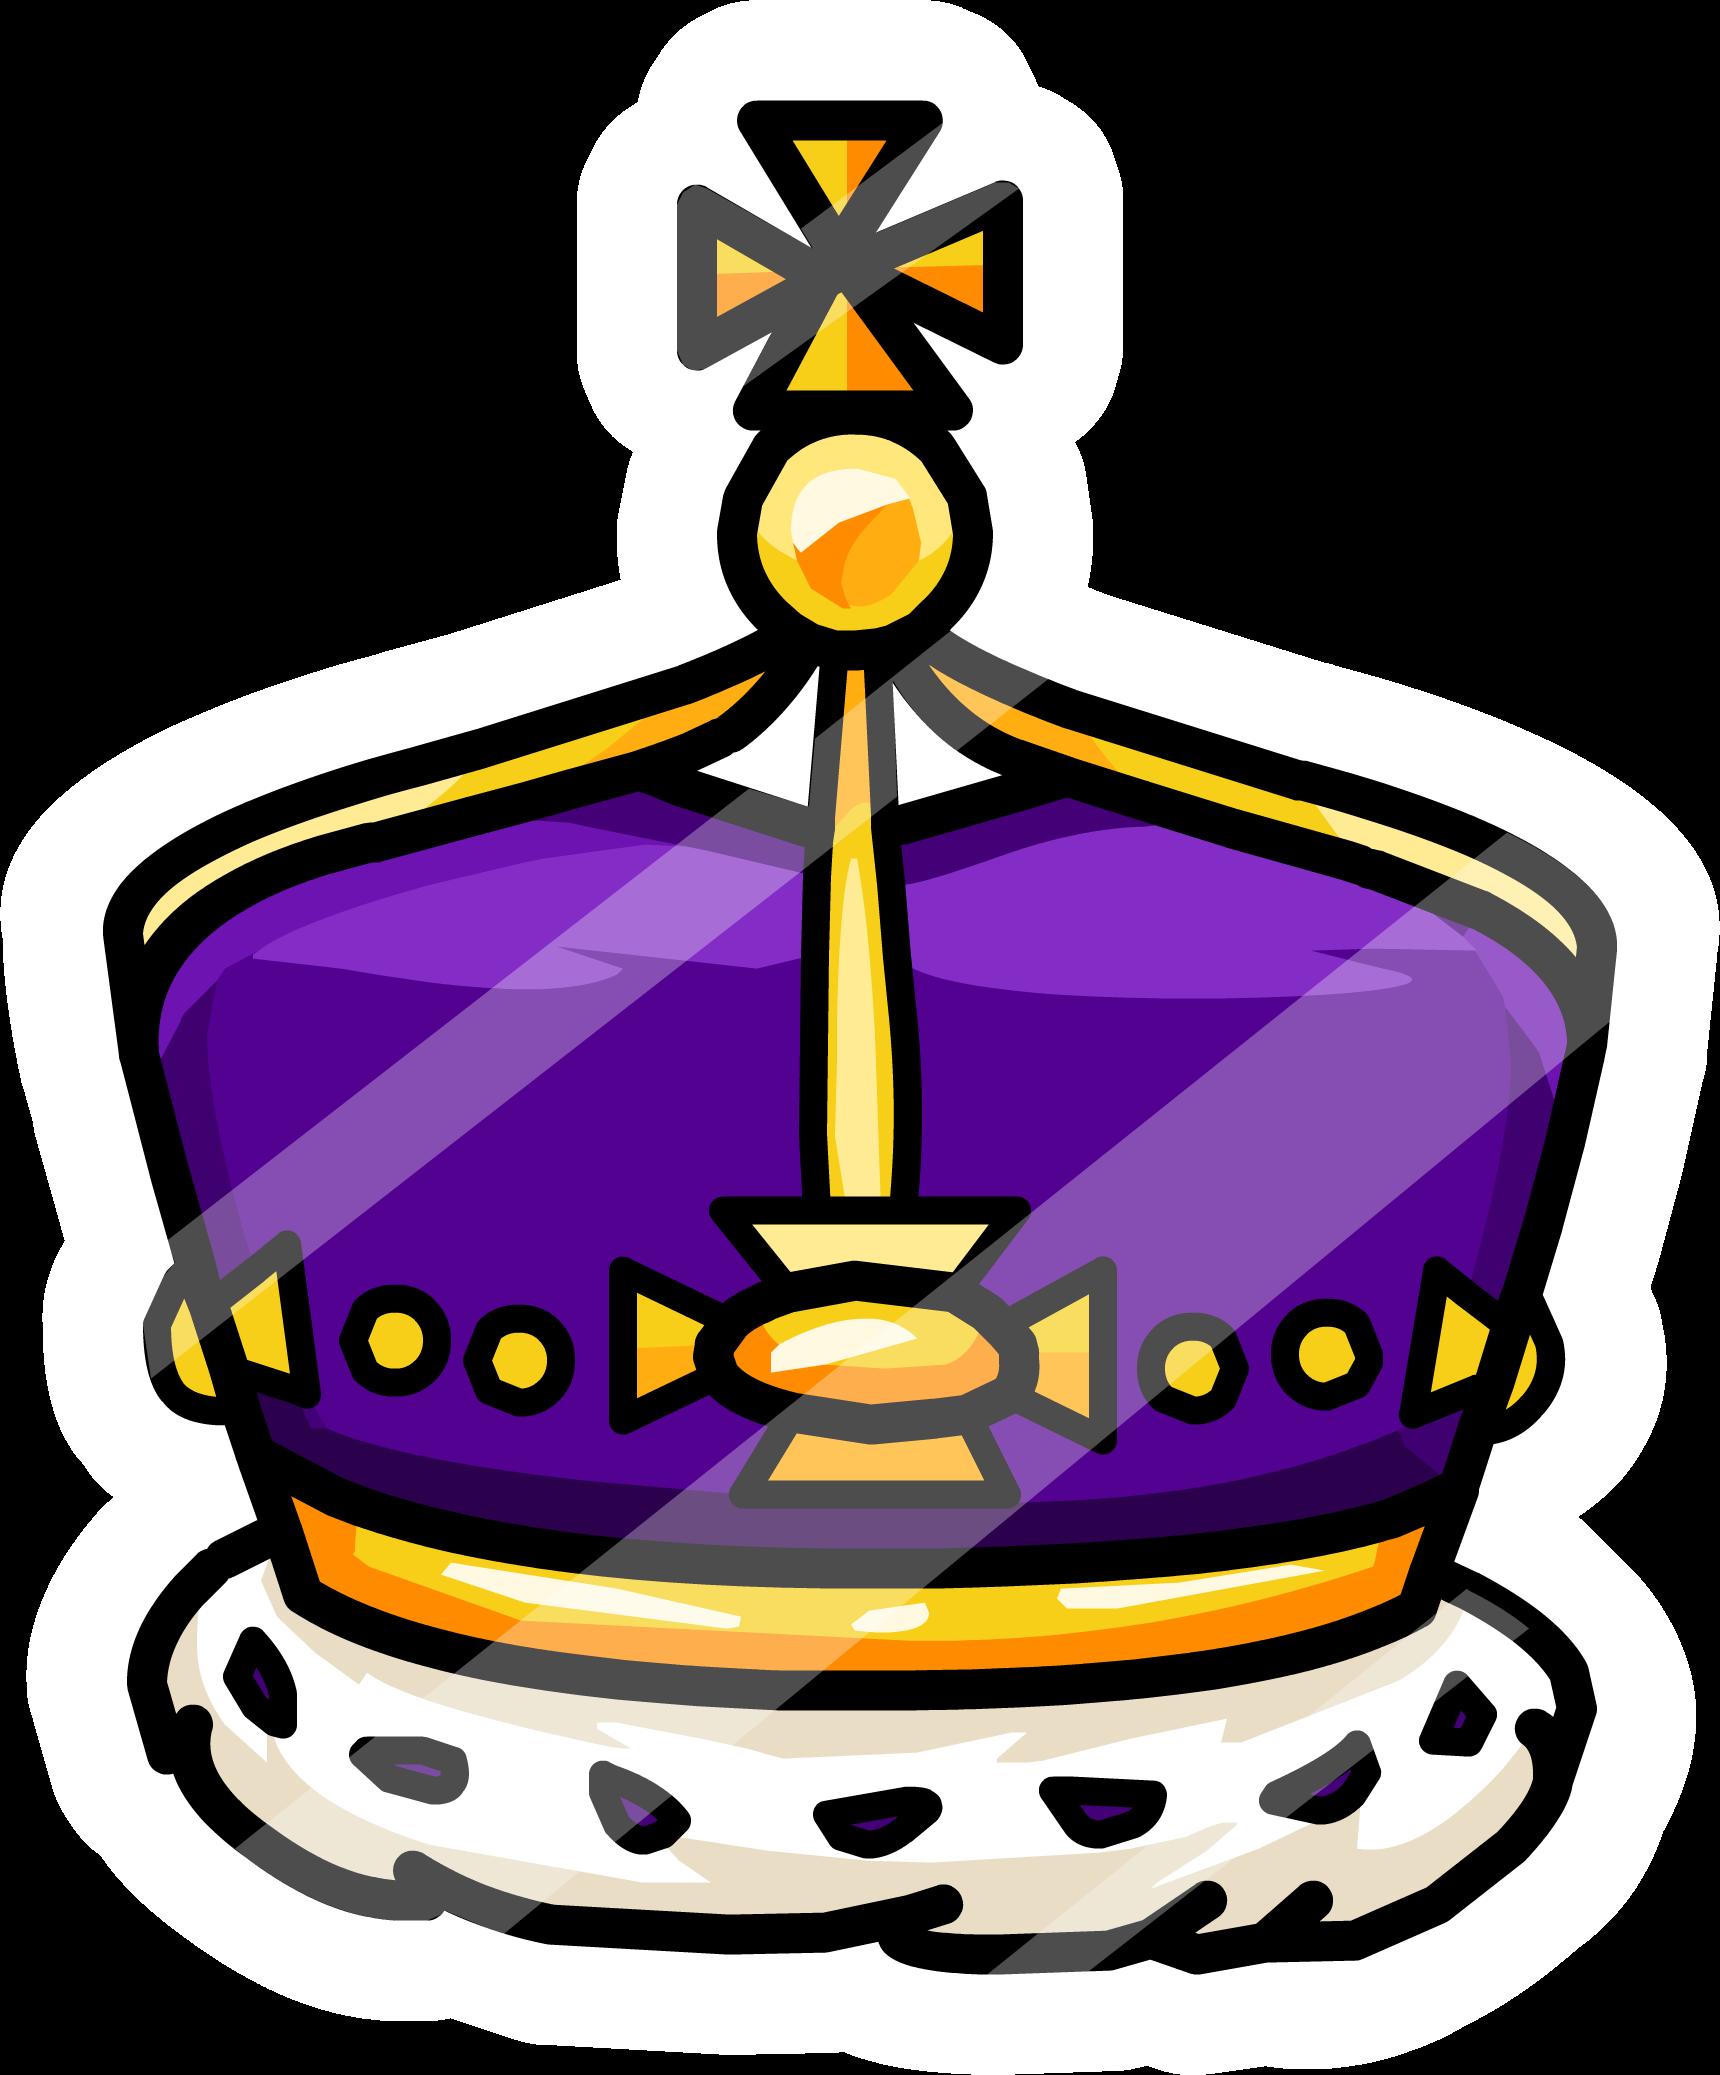 1720x2075 Royal Crown Pin Club Penguin Wiki Fandom Powered By Wikia